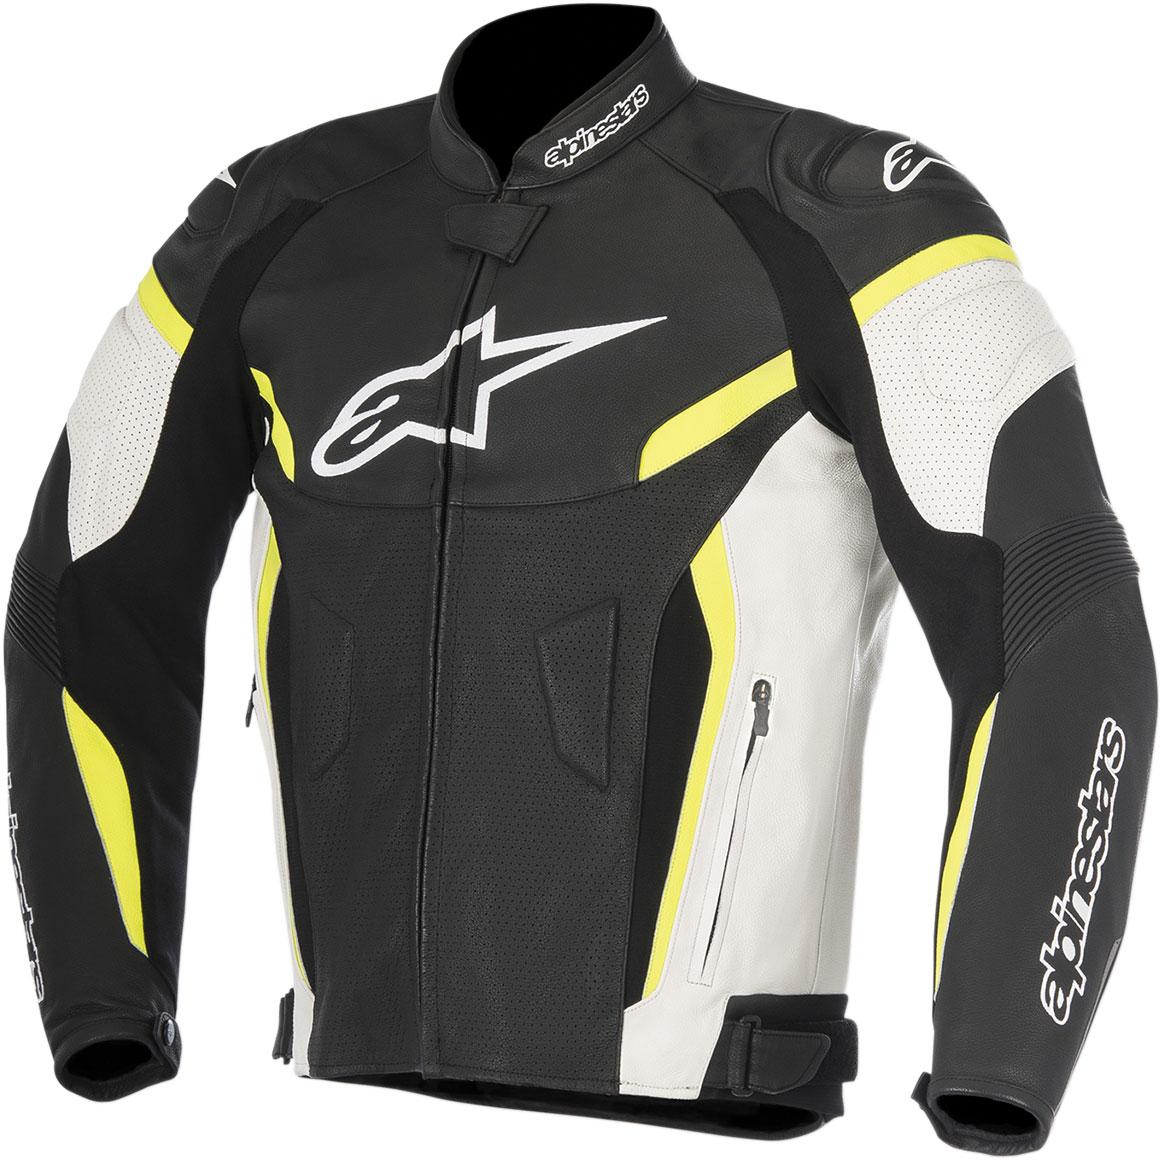 Alpinestars GP PLUS R V2 Airflow Perforated Leather Jacket (Black/White/Flo Yellow)